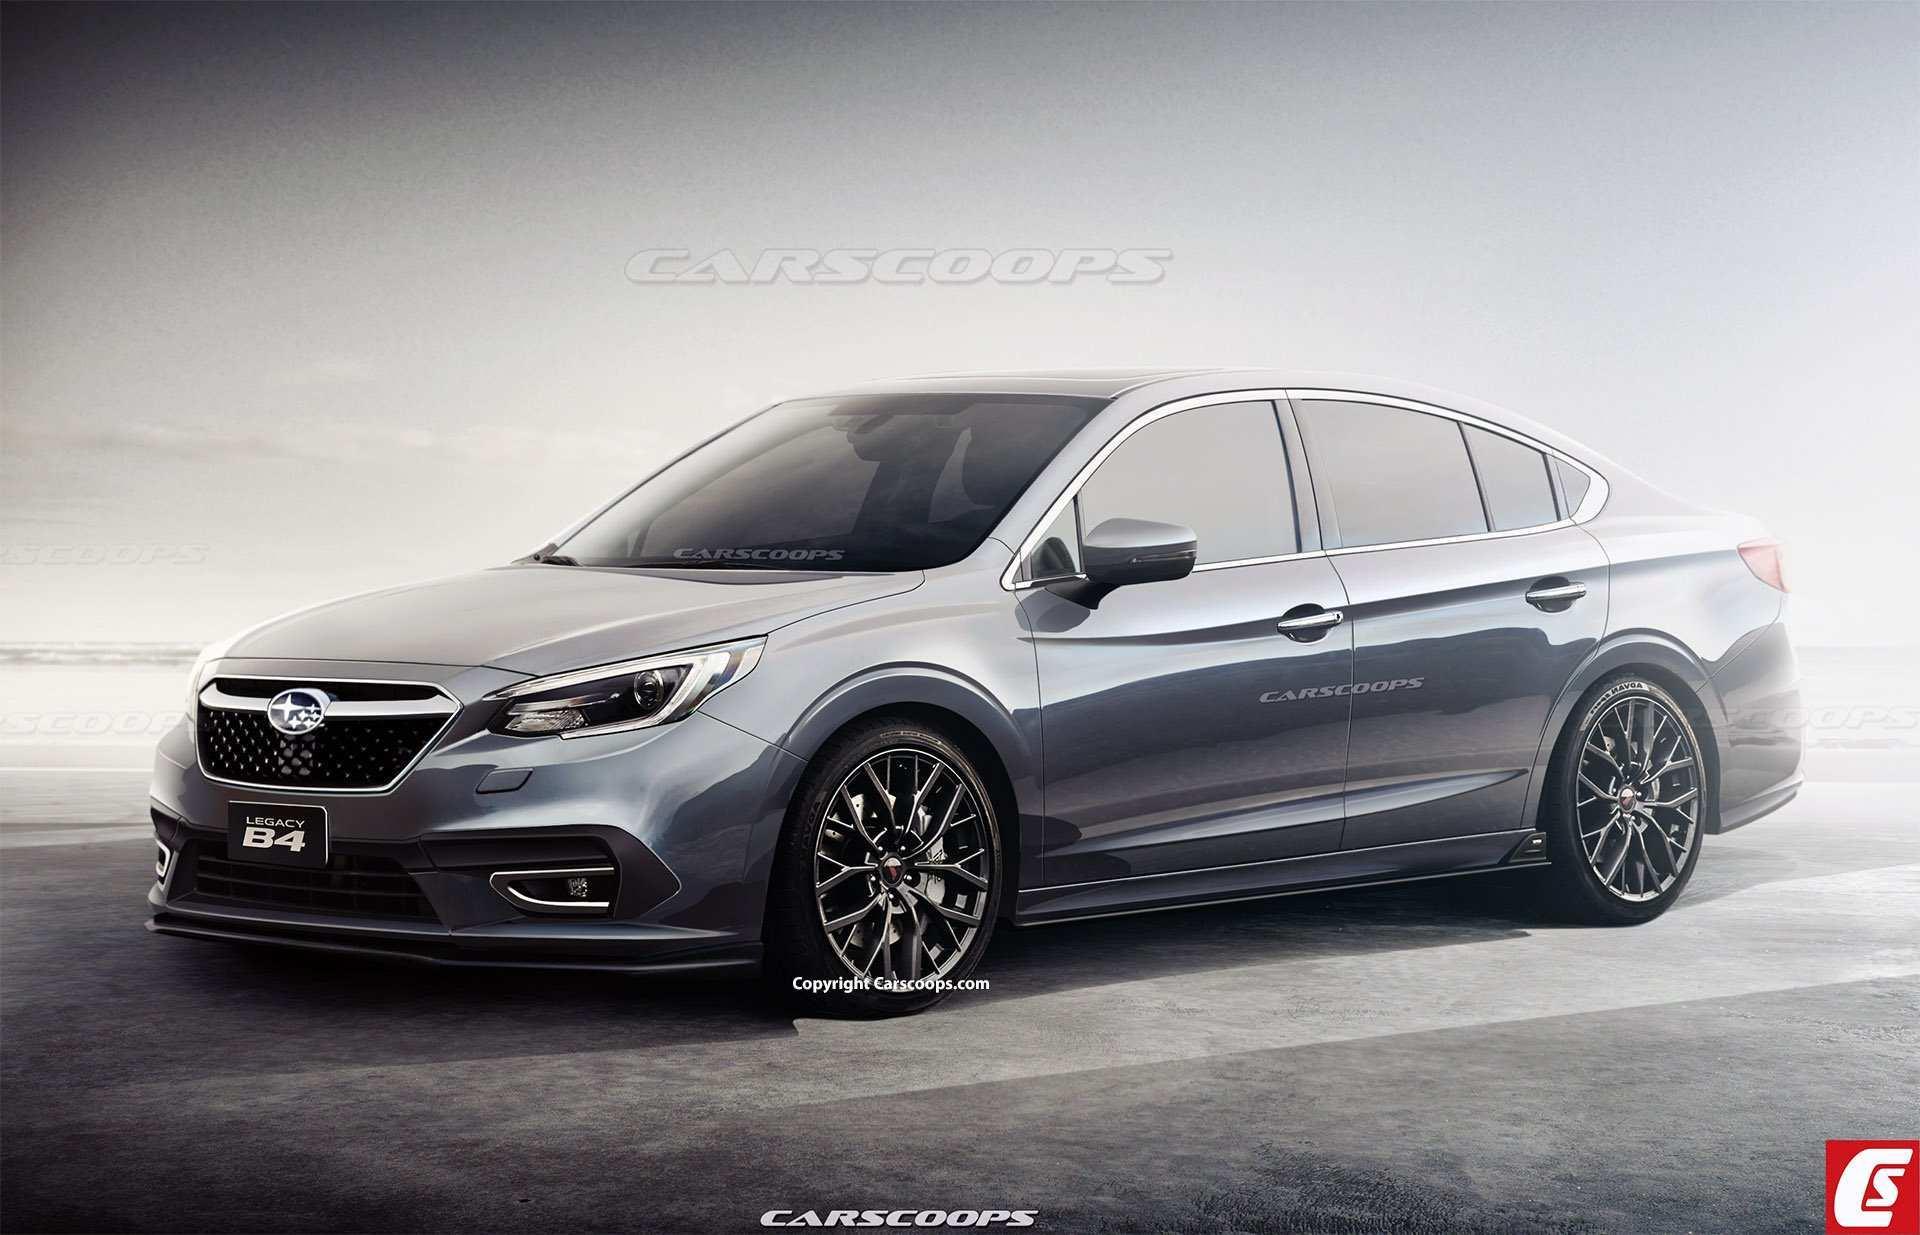 38 Concept of Subaru Japan 2020 Images by Subaru Japan 2020